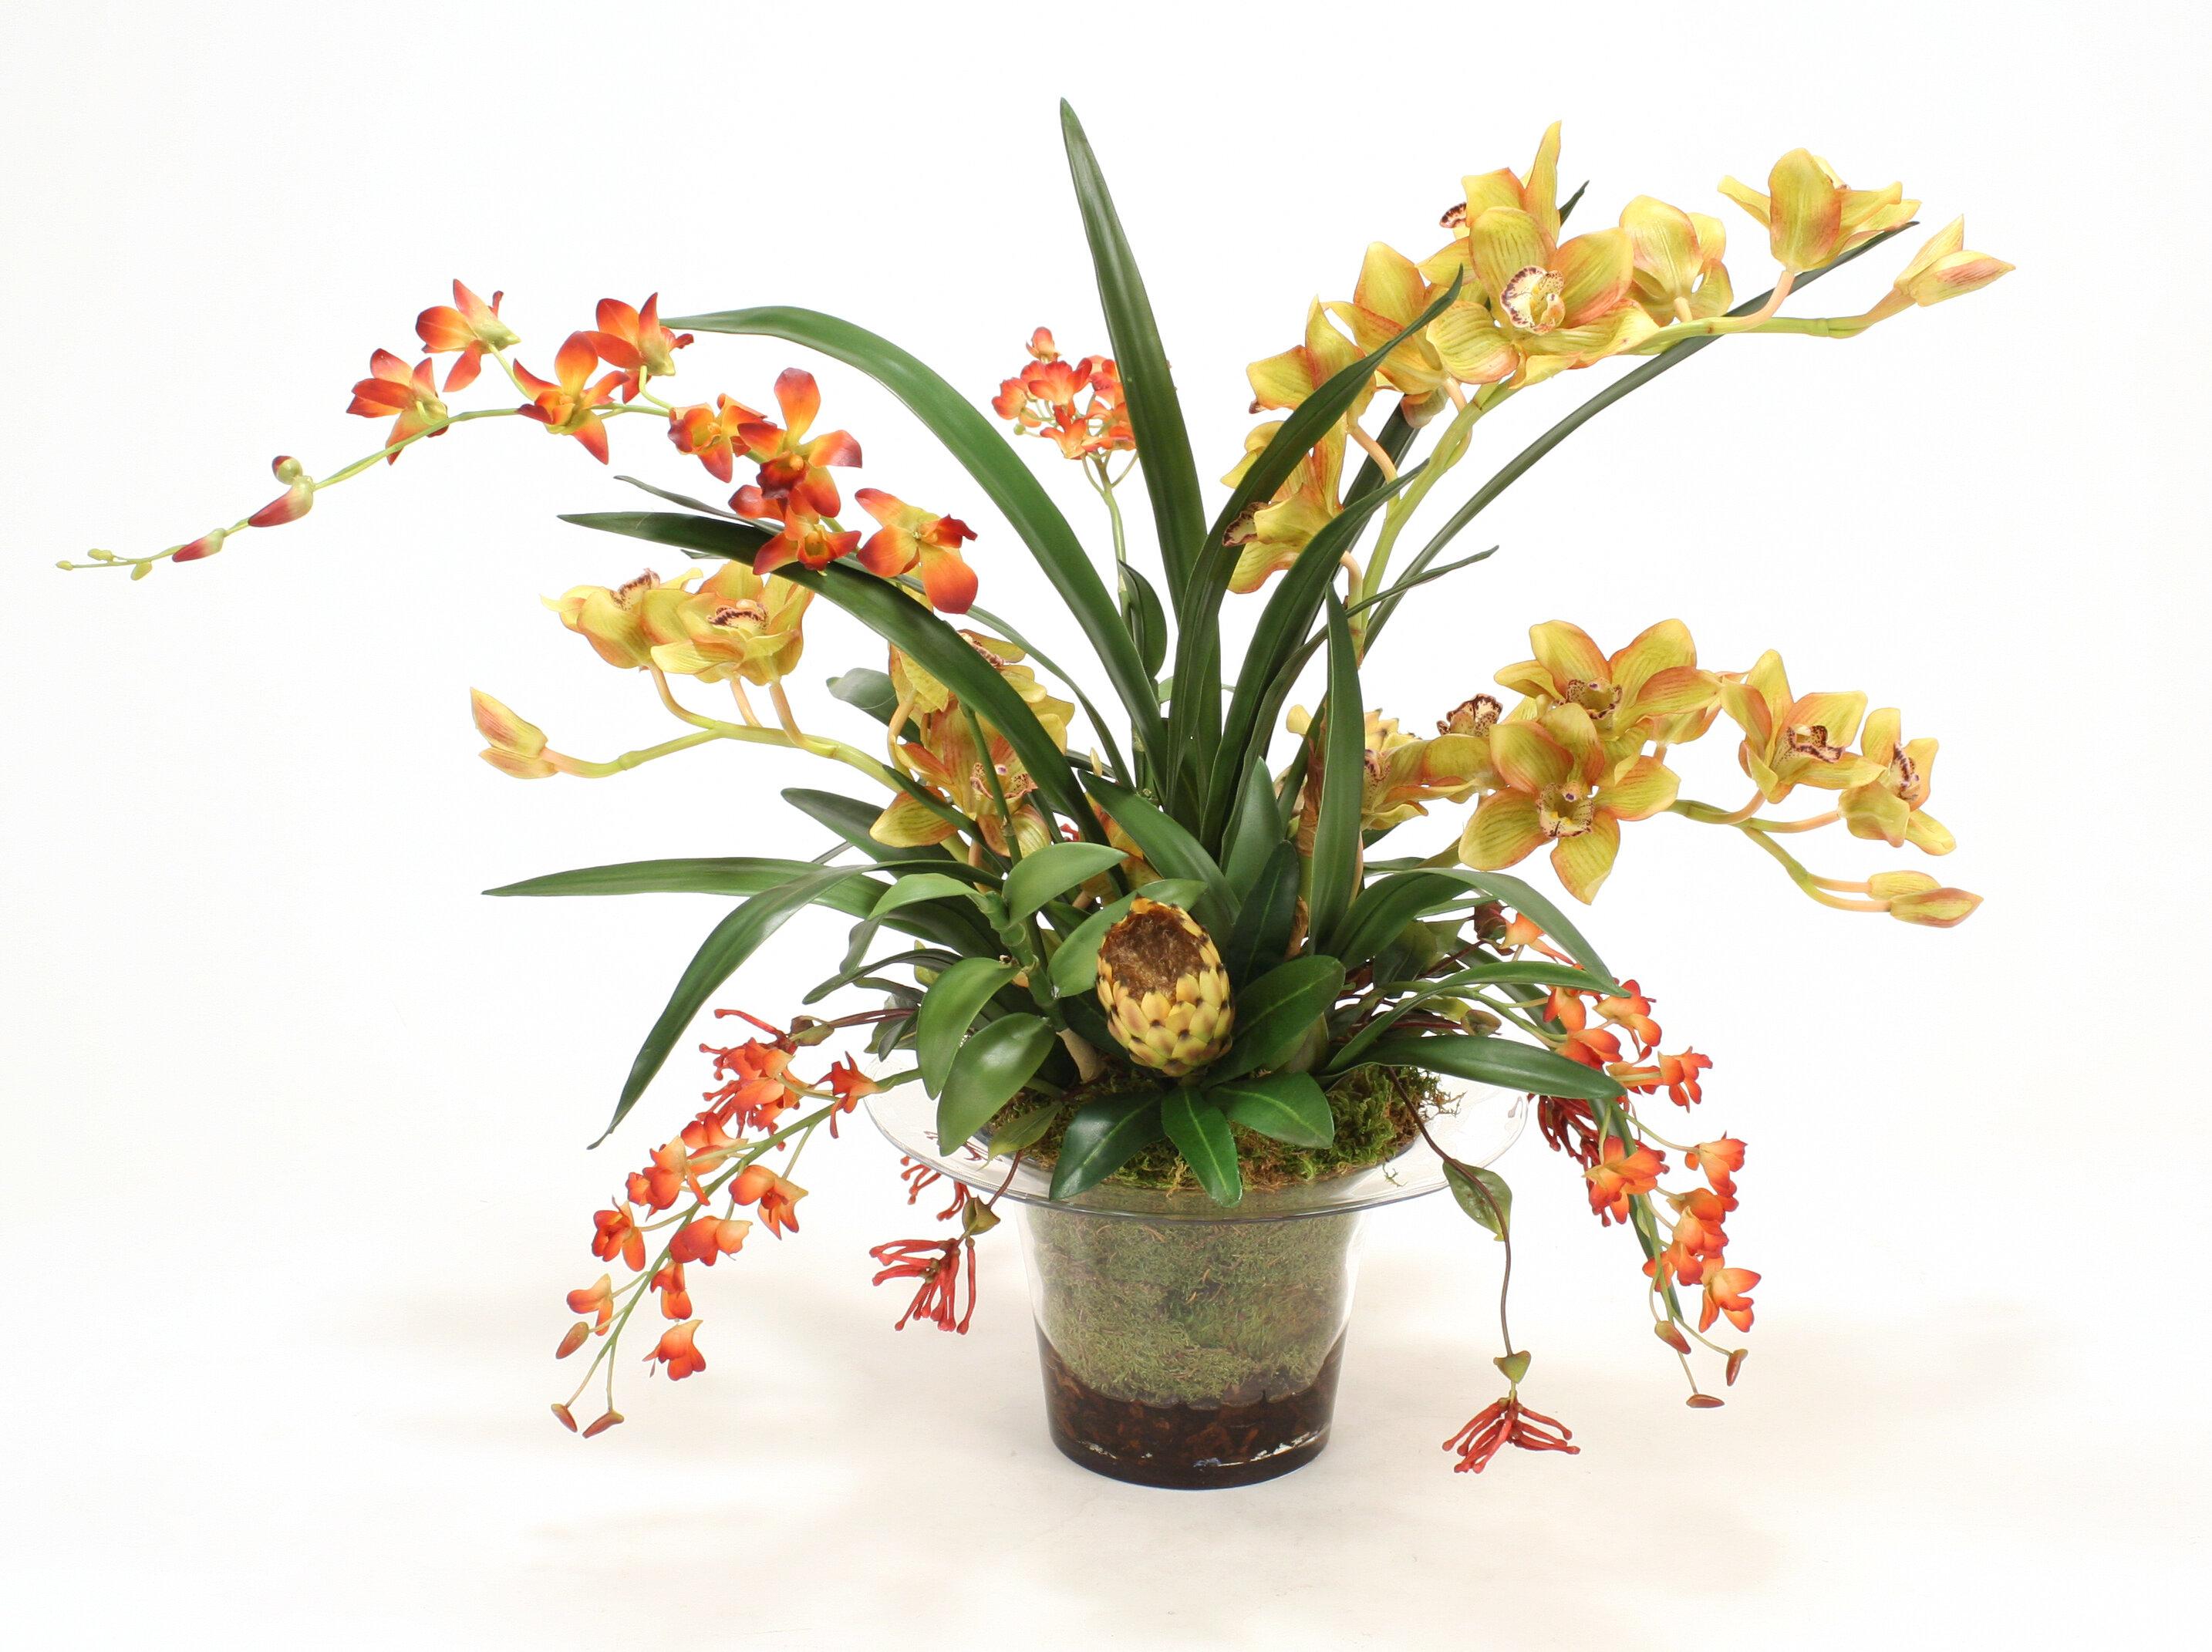 floral home decor orchid floral design wayfair.htm distinctive designs tropical orchid mix in glass vase wayfair  tropical orchid mix in glass vase